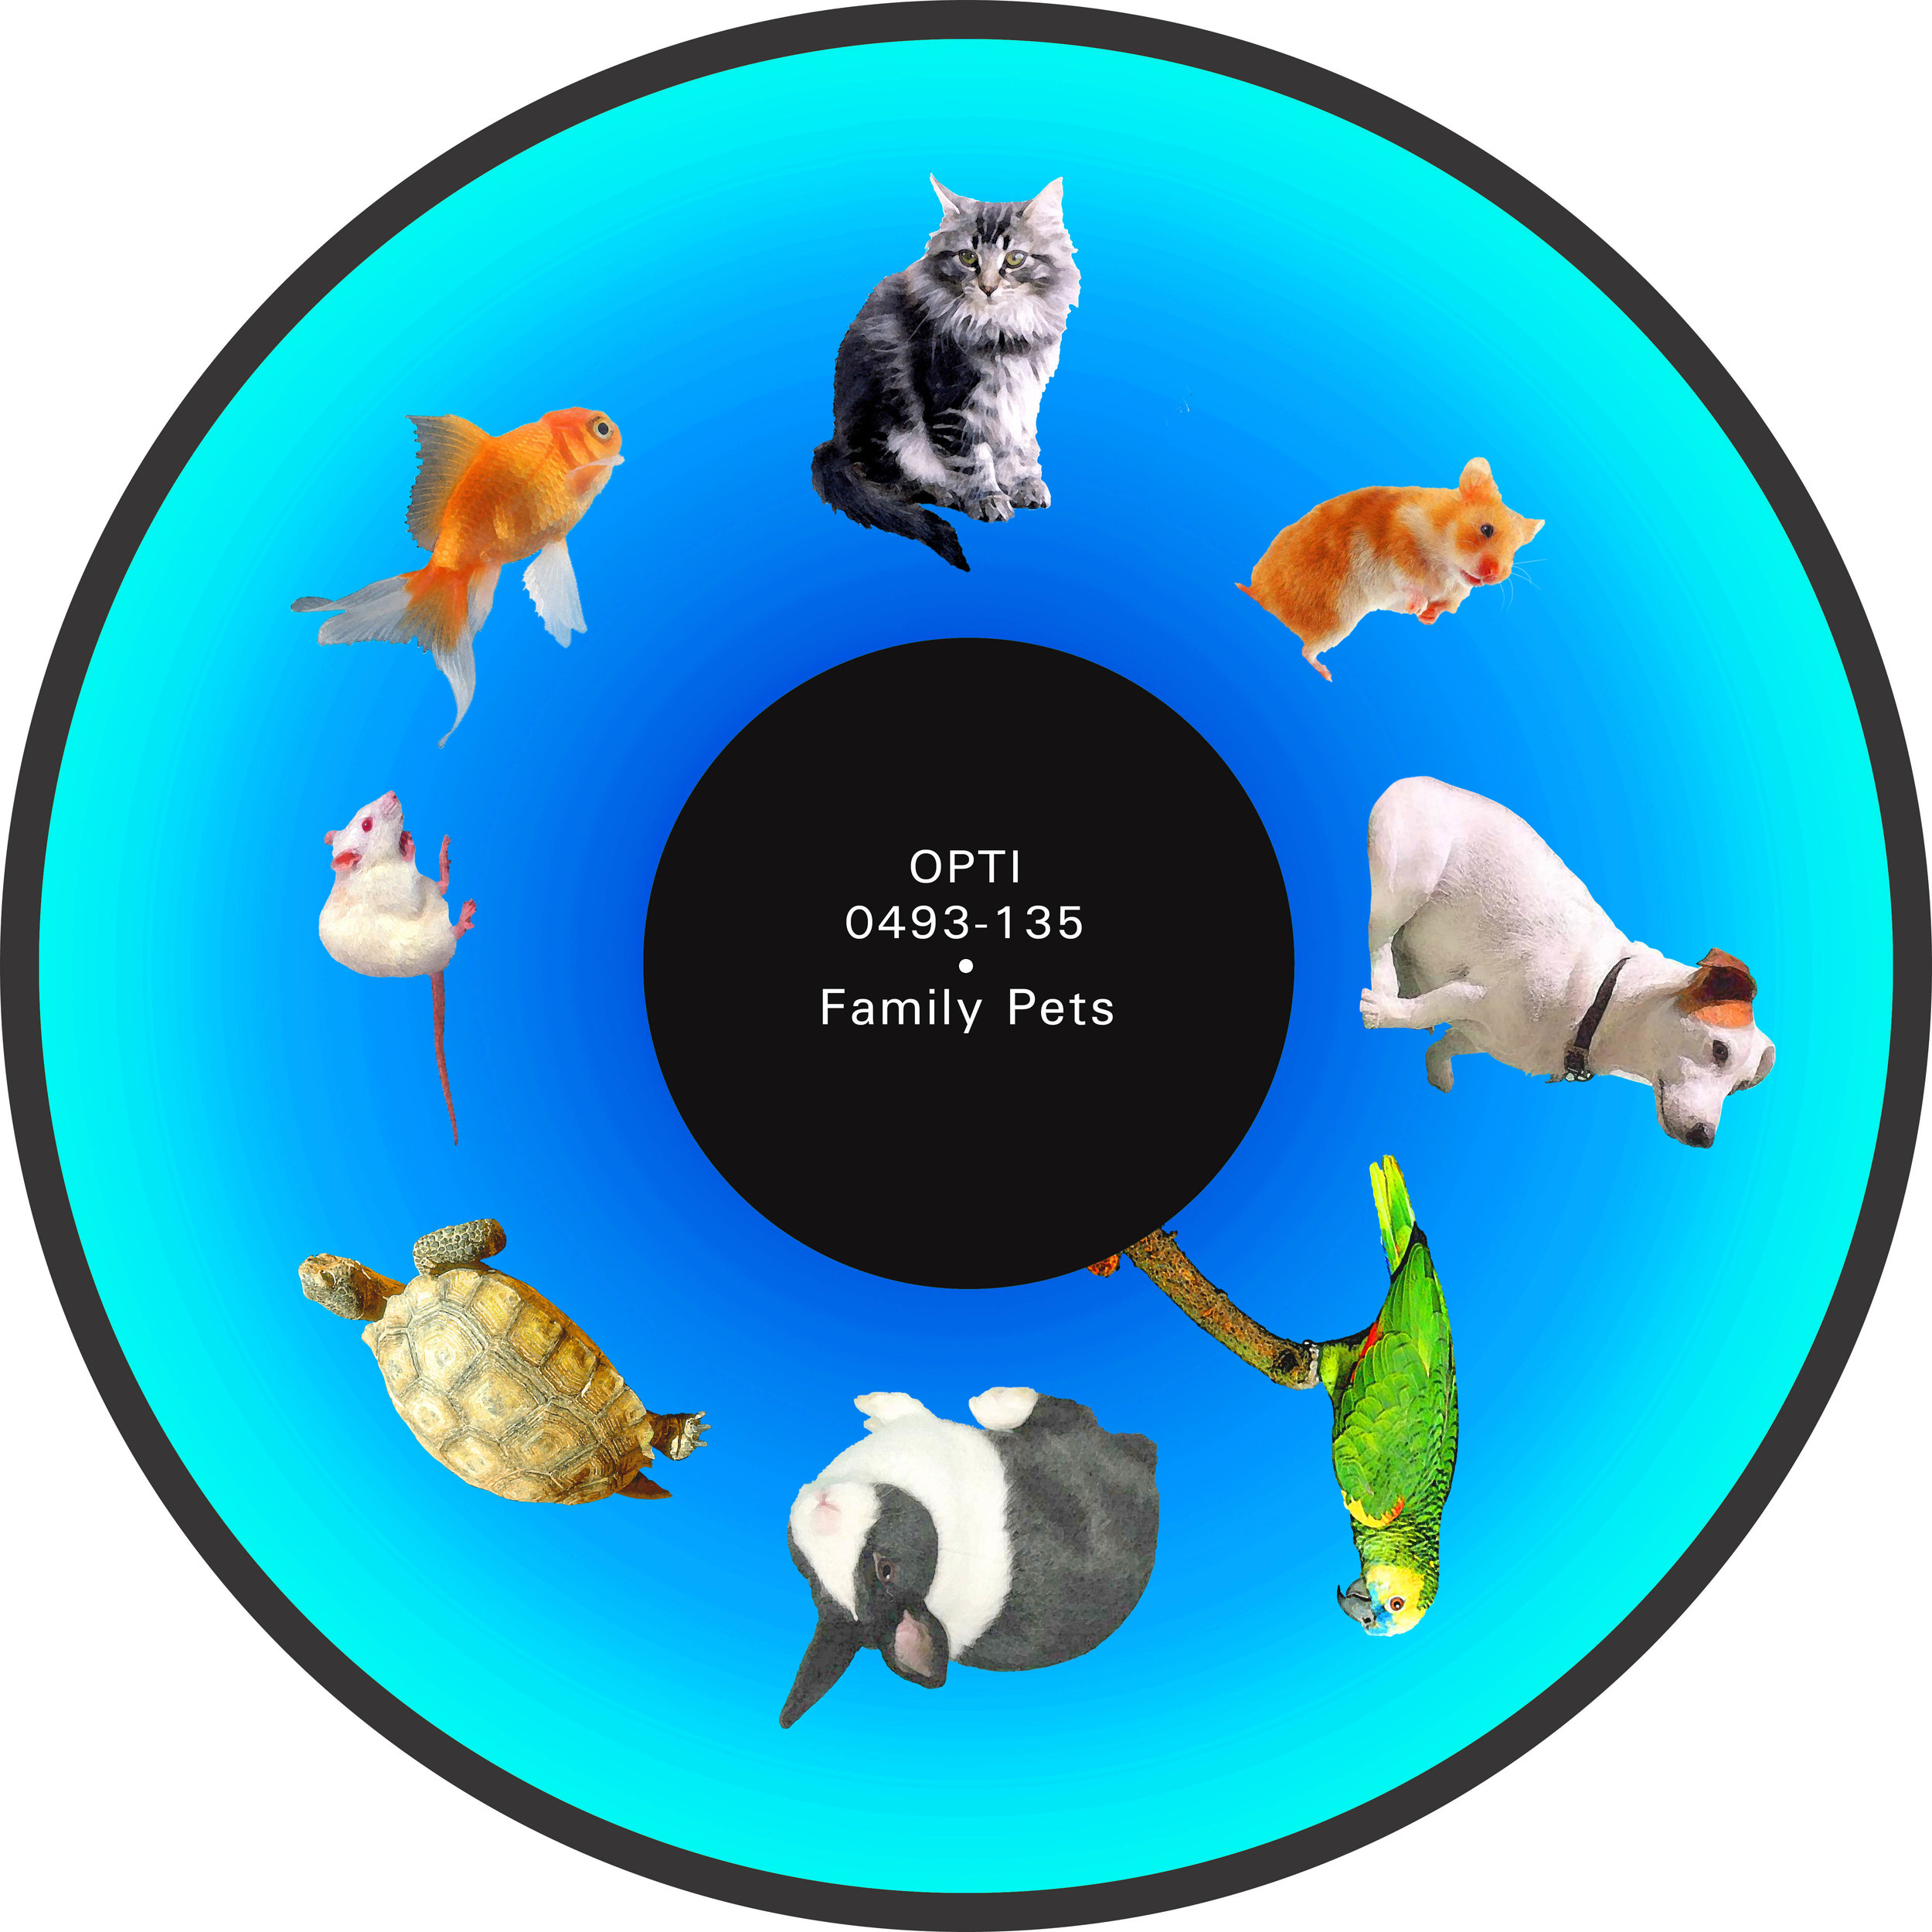 optikinetics-family-pets-fg7426.jpg